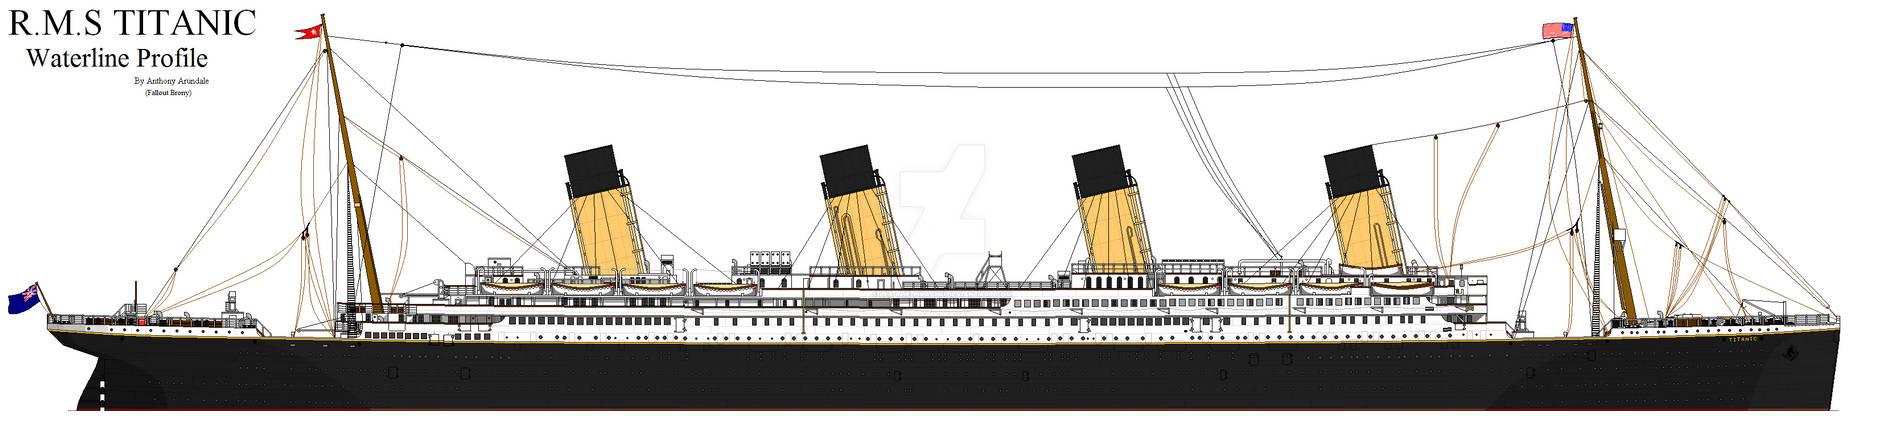 RMS Titanic Waterline Profile